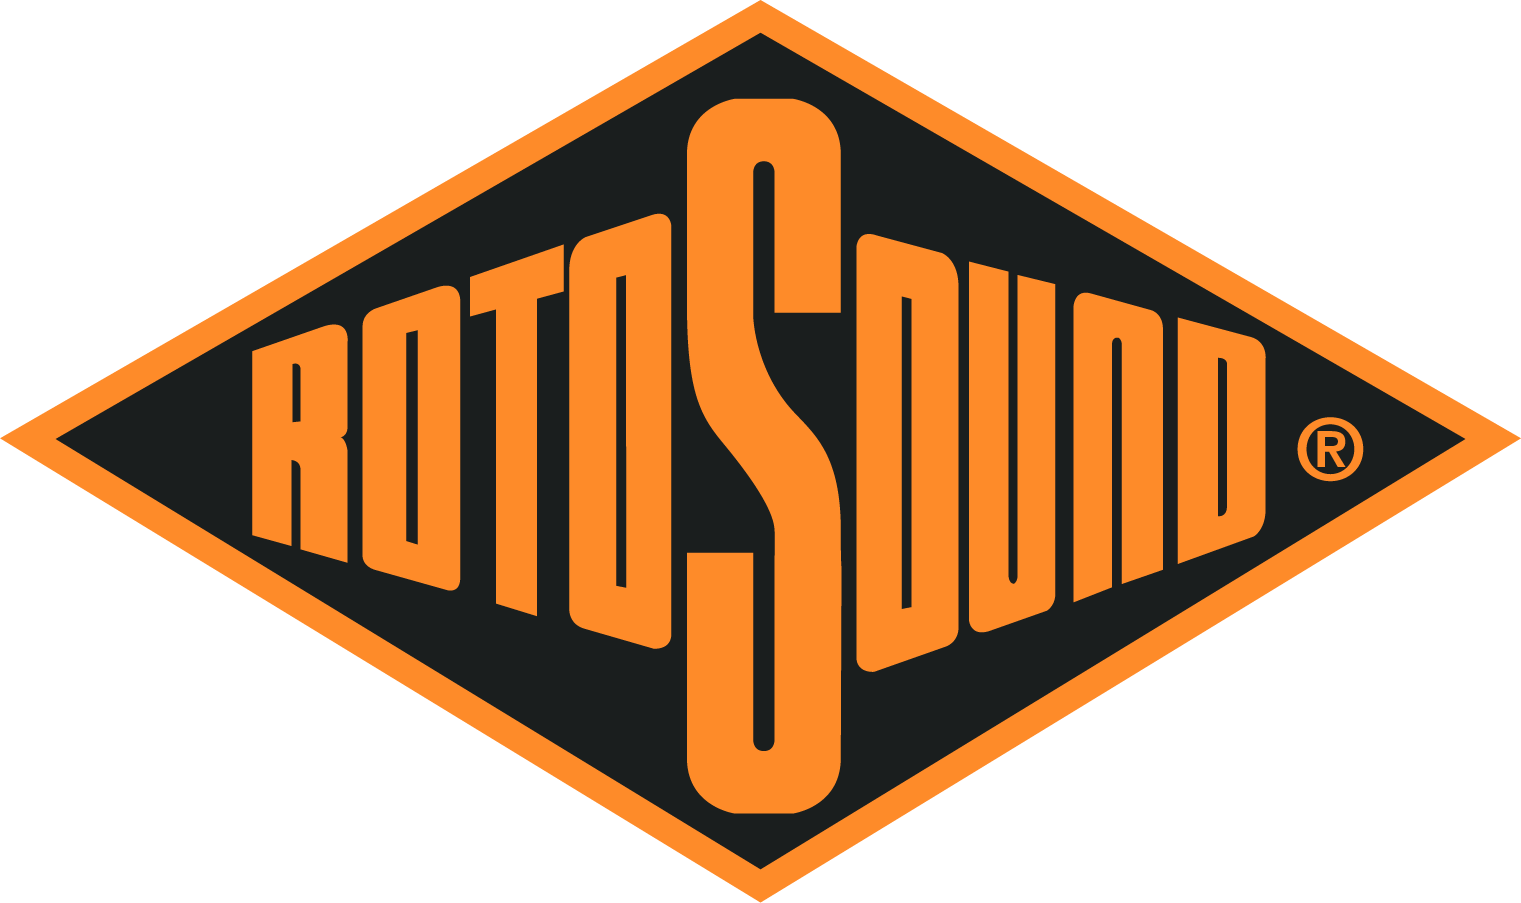 Rotosound Blog